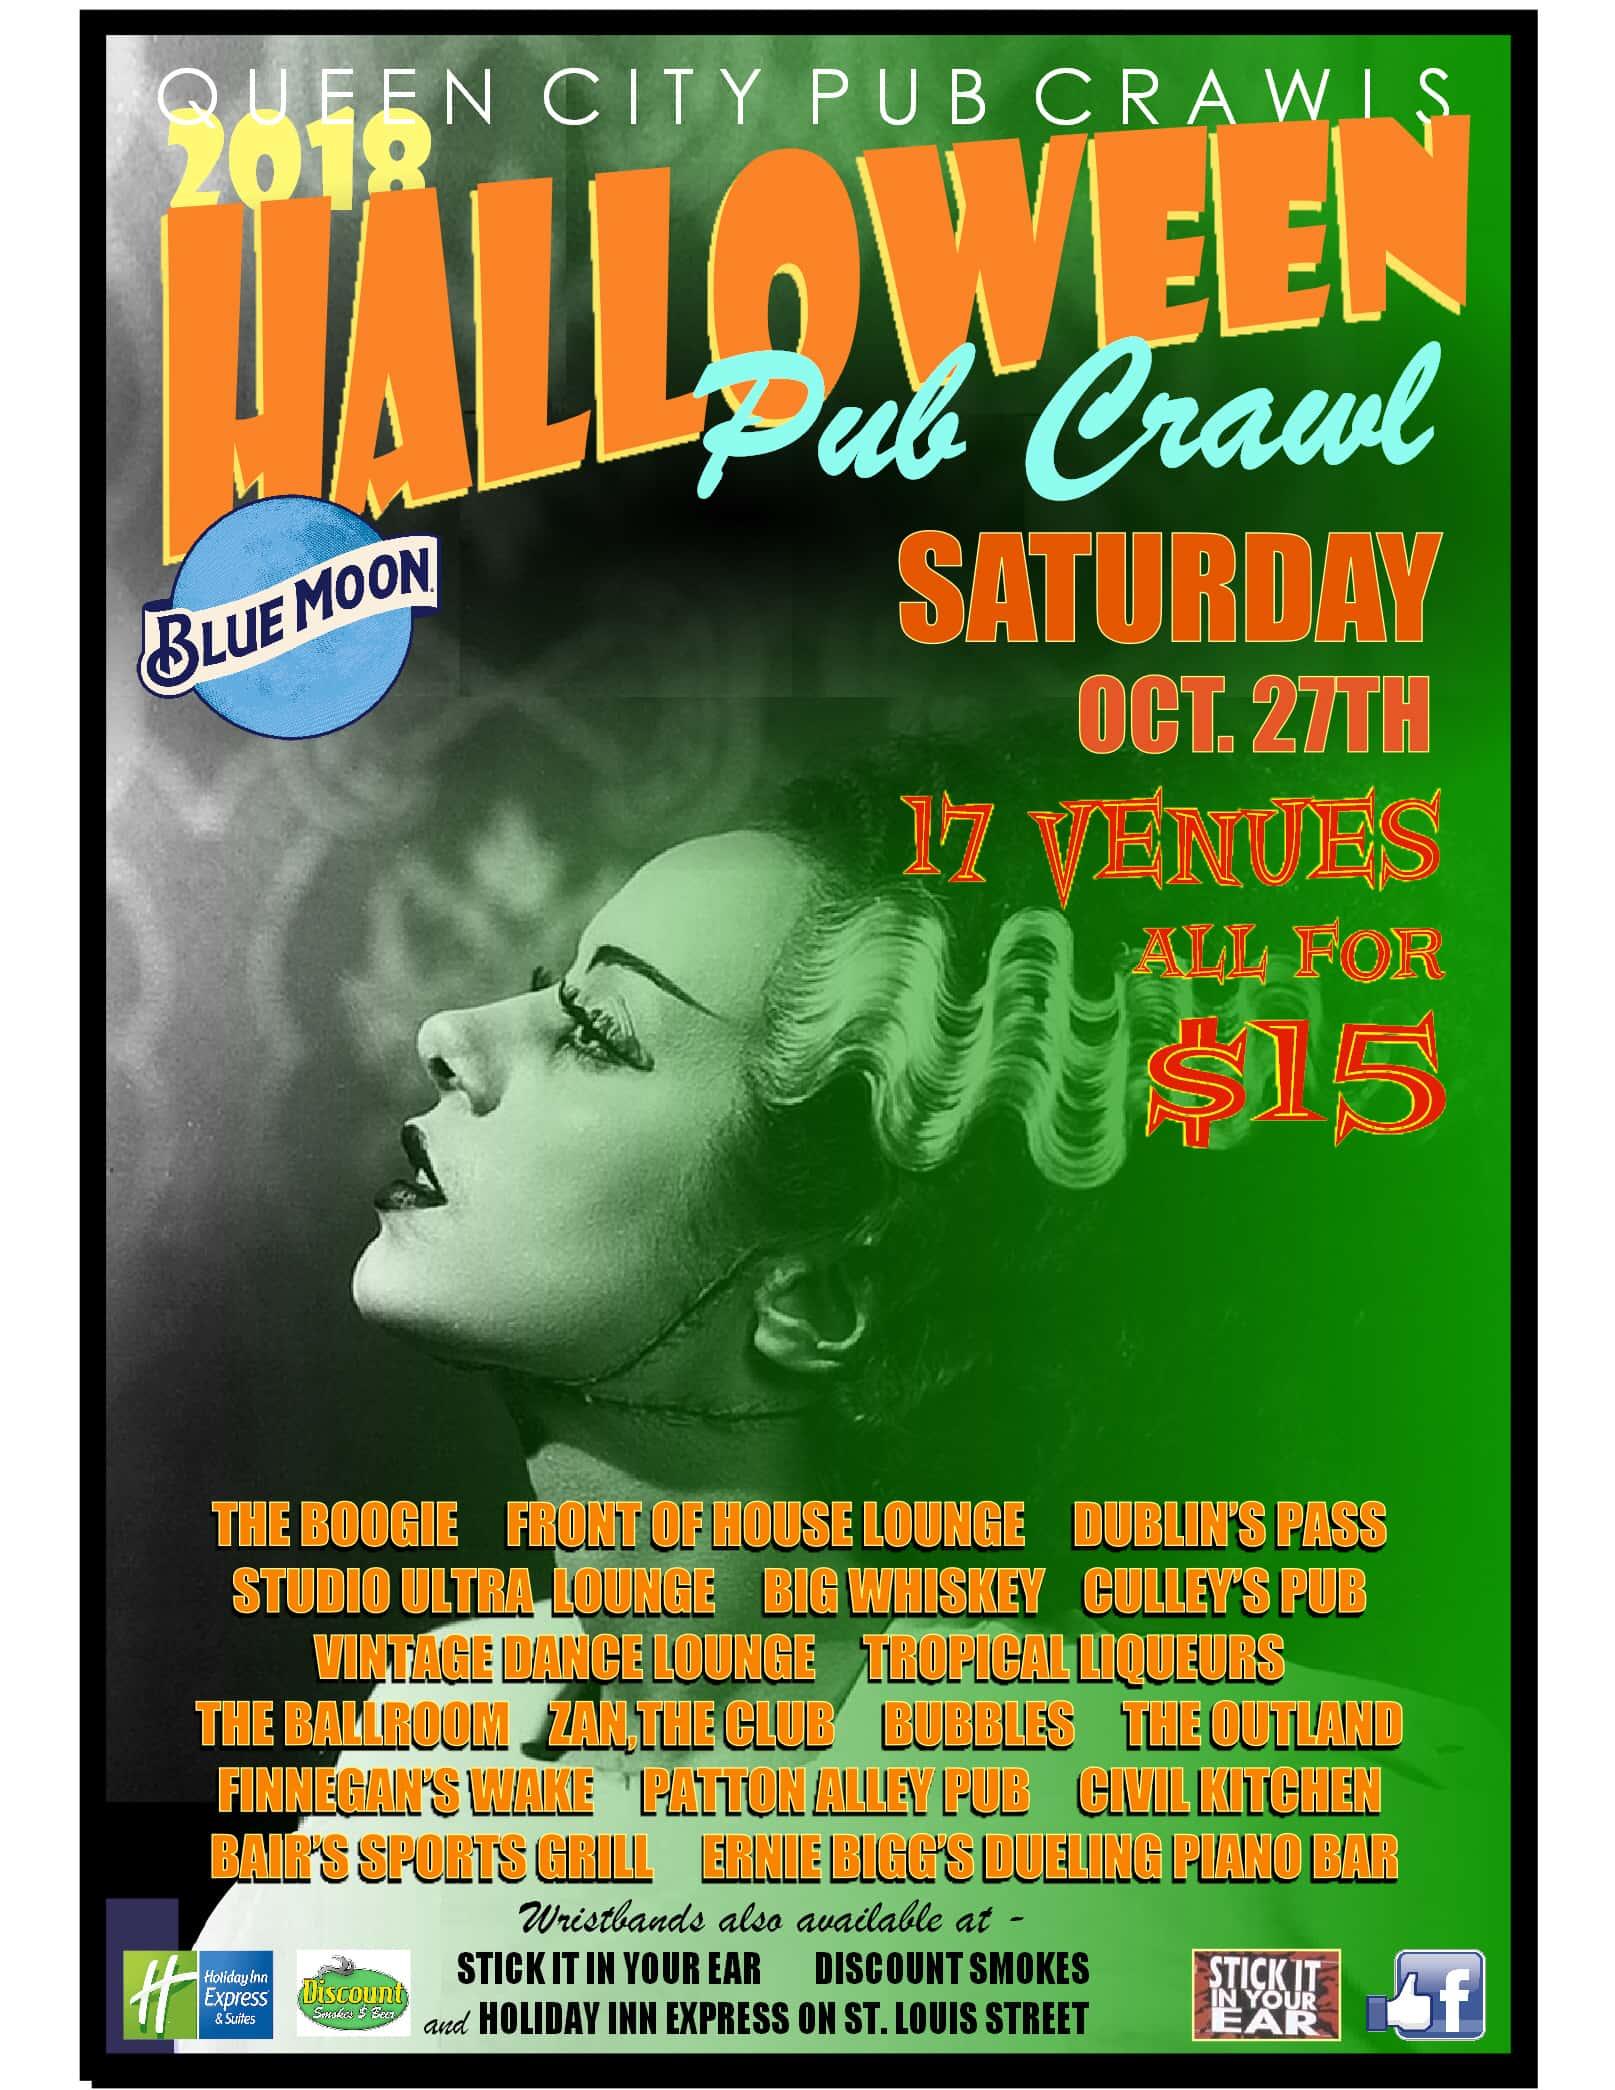 Springfield Mo Halloween Pub Crawl 2020 HALLOWEEN PUB CRAWL! | Q102 Springfield's Rock Station